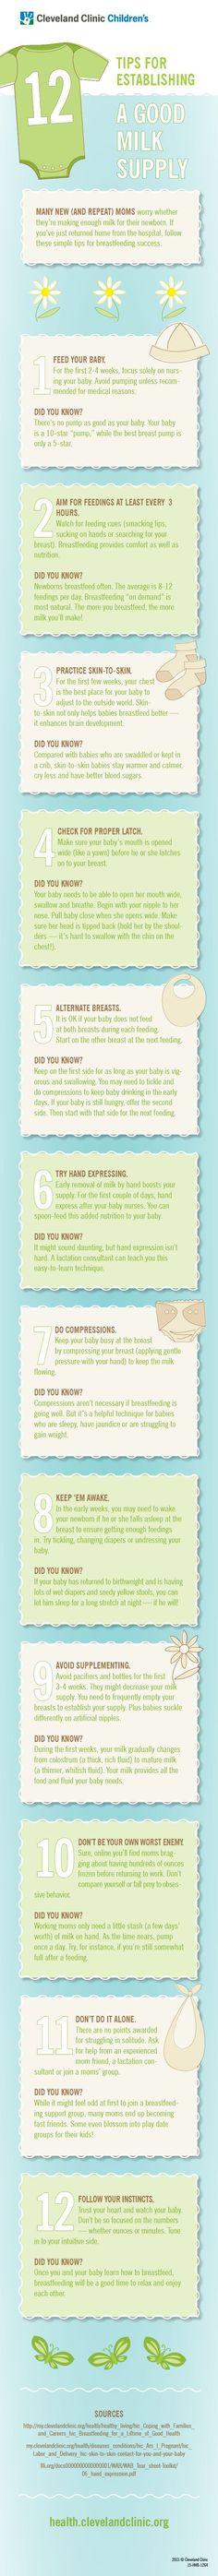 12 Tips for Establishing a Good Breast Milk Supply #infographic #breastfeeding